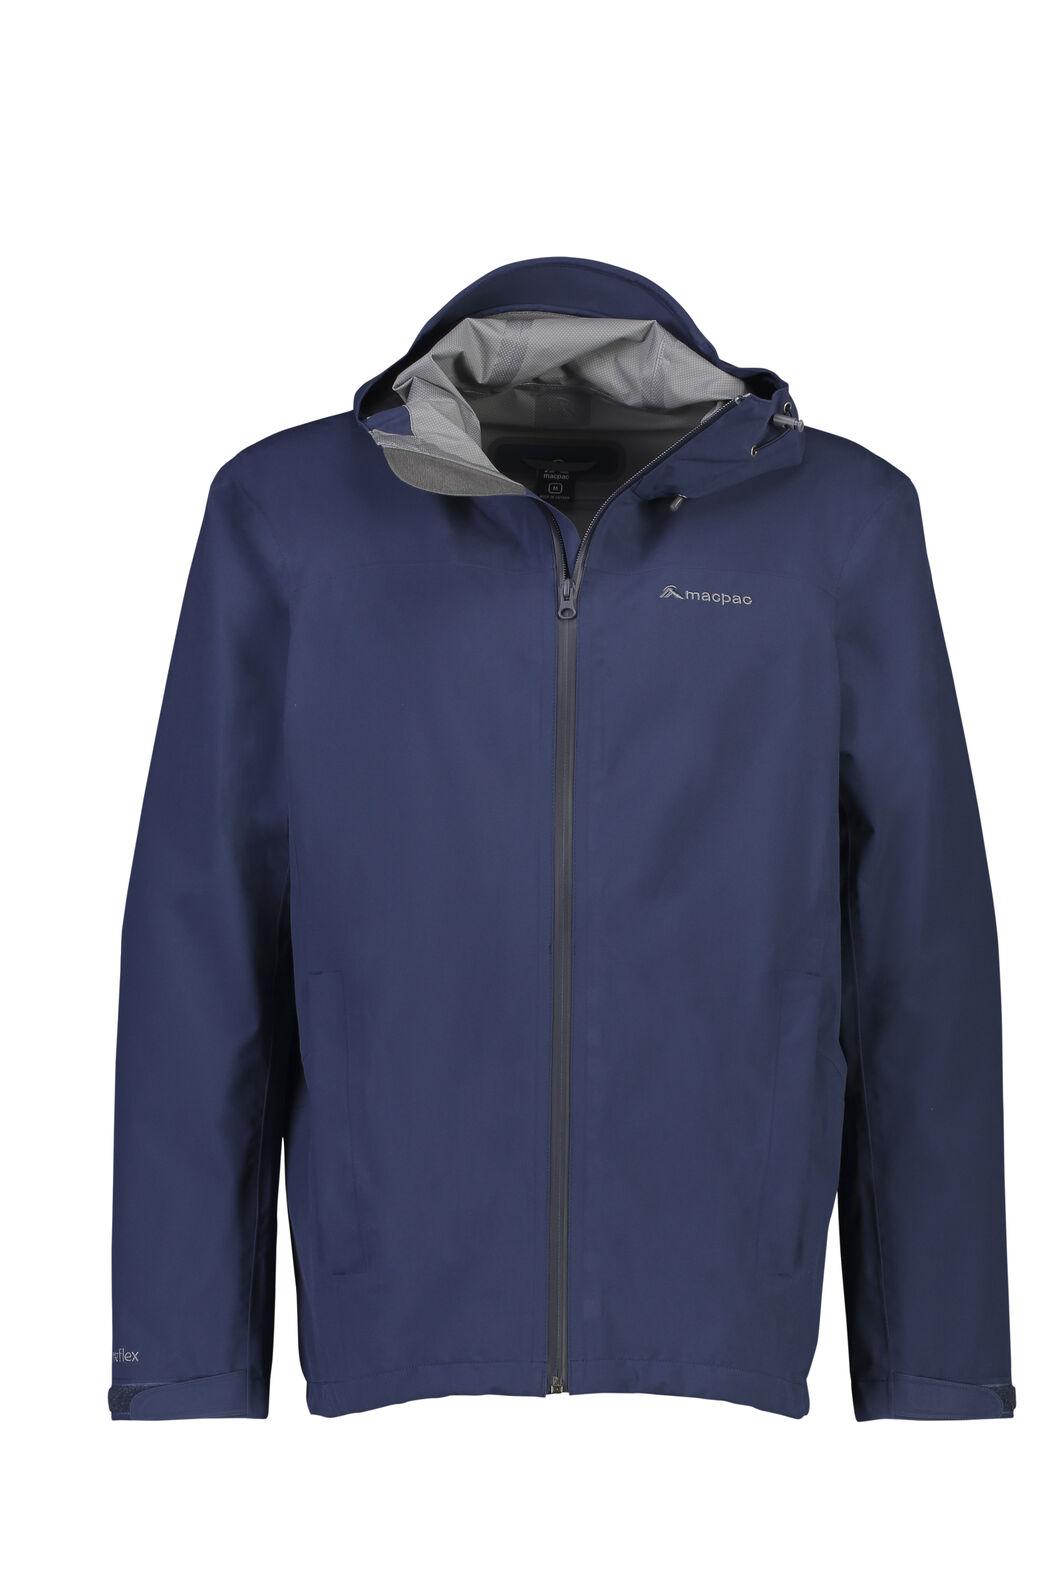 Macpac Dispatch Rain Jacket - Men's, Black Iris, hi-res